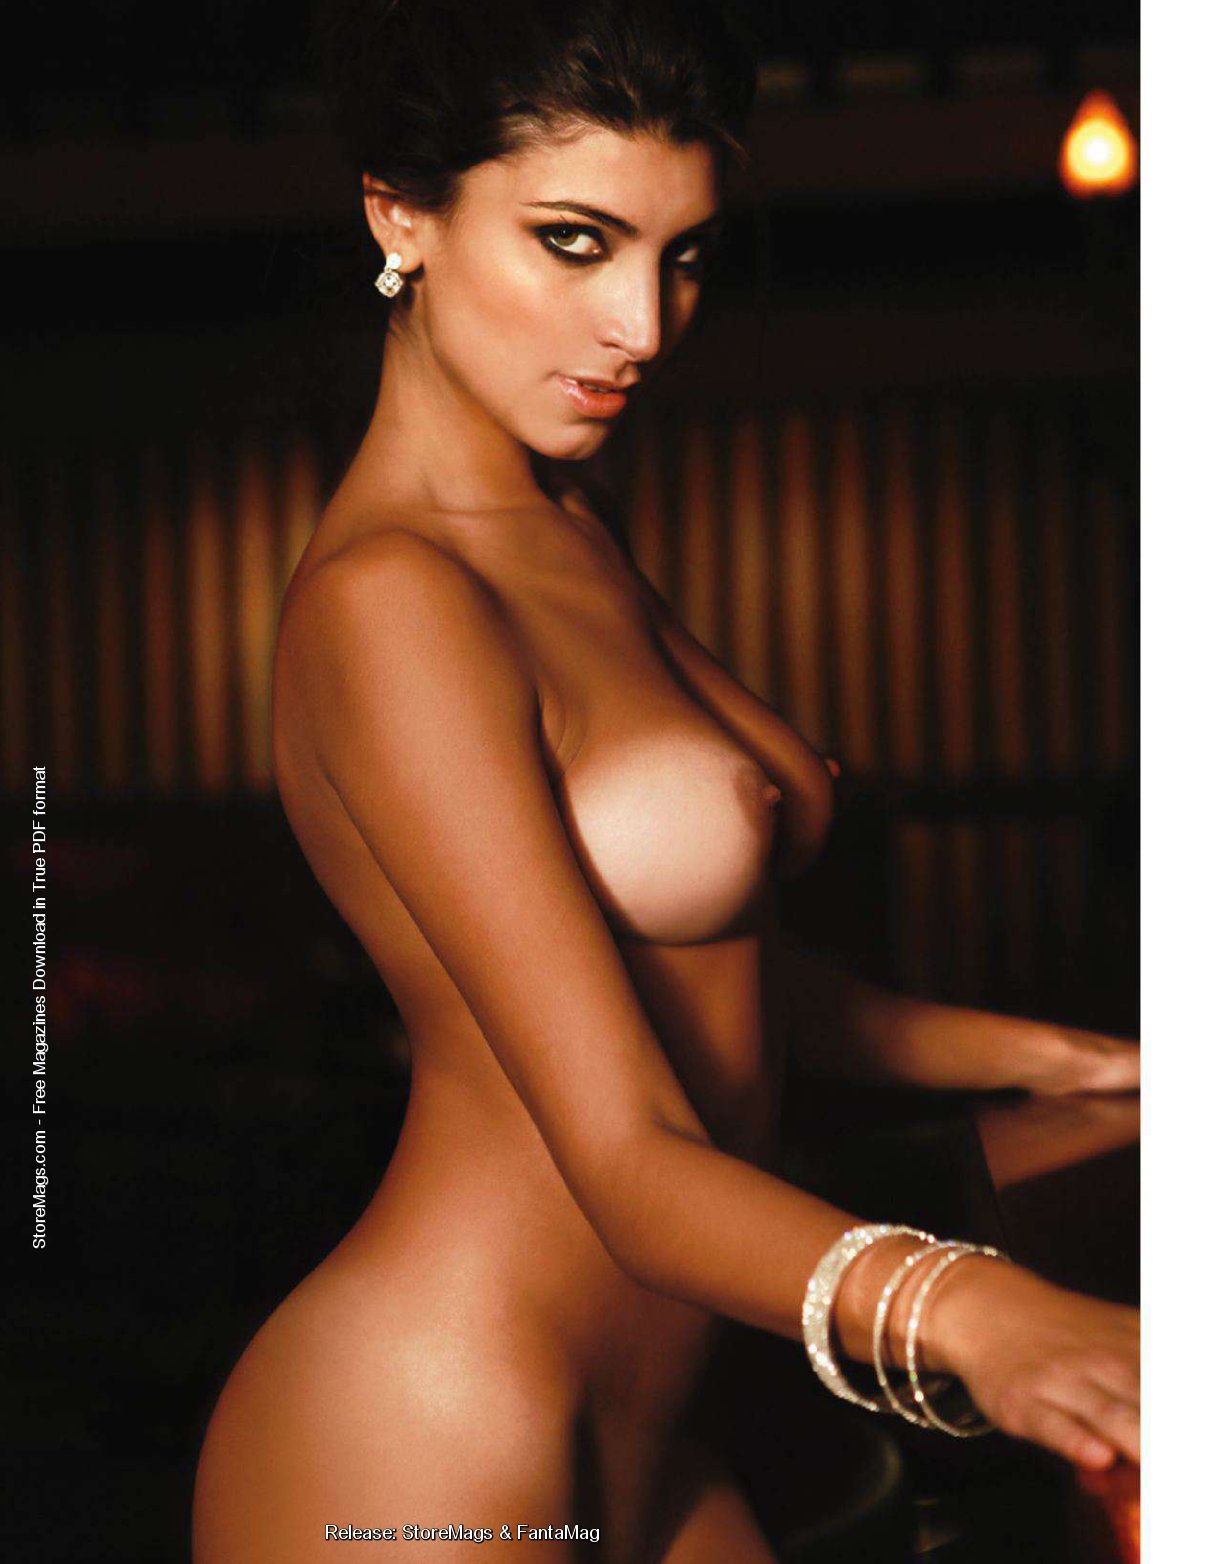 http://1.bp.blogspot.com/-mlP6mnLDNyk/TgOIpOXhqFI/AAAAAAAADFc/E-BCgq2ljVk/s1600/Solange+Gomez+Nude+For+Playboy+Argentina+www.GutterUncensored.com+017.jpg